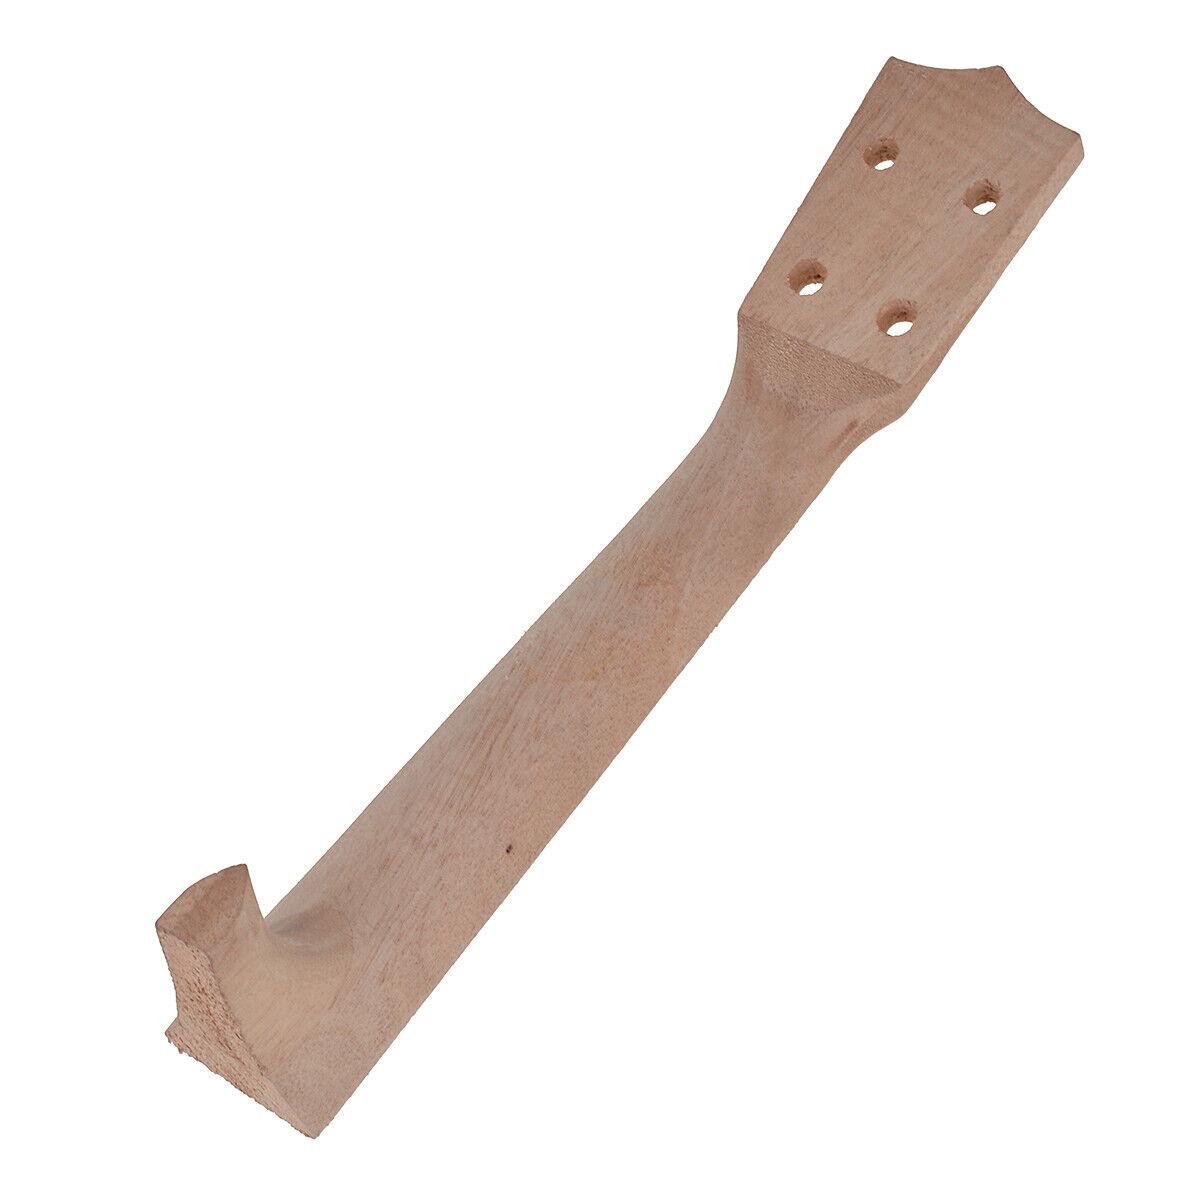 neck and fretboard for 26 inch tenor ukulele hawaii guitar parts maple wood ebay